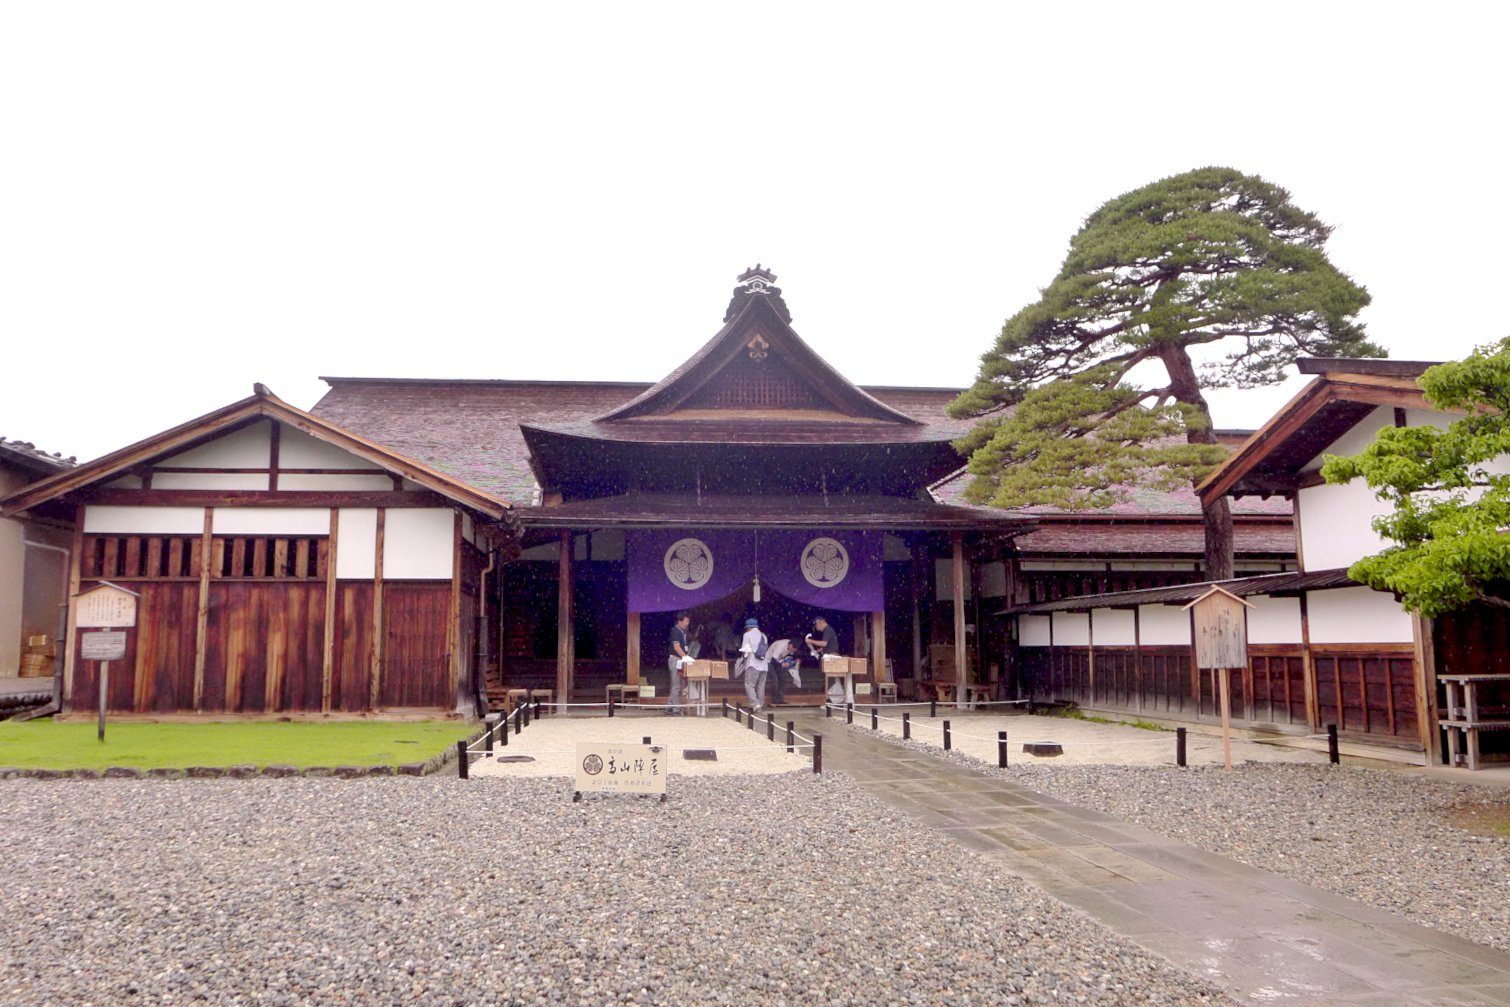 Takayama Jinya; Takayama Japan travel; What to do in Takayama Japan; What to see in Takayama Japan; D.I.Y. Japan itinerary